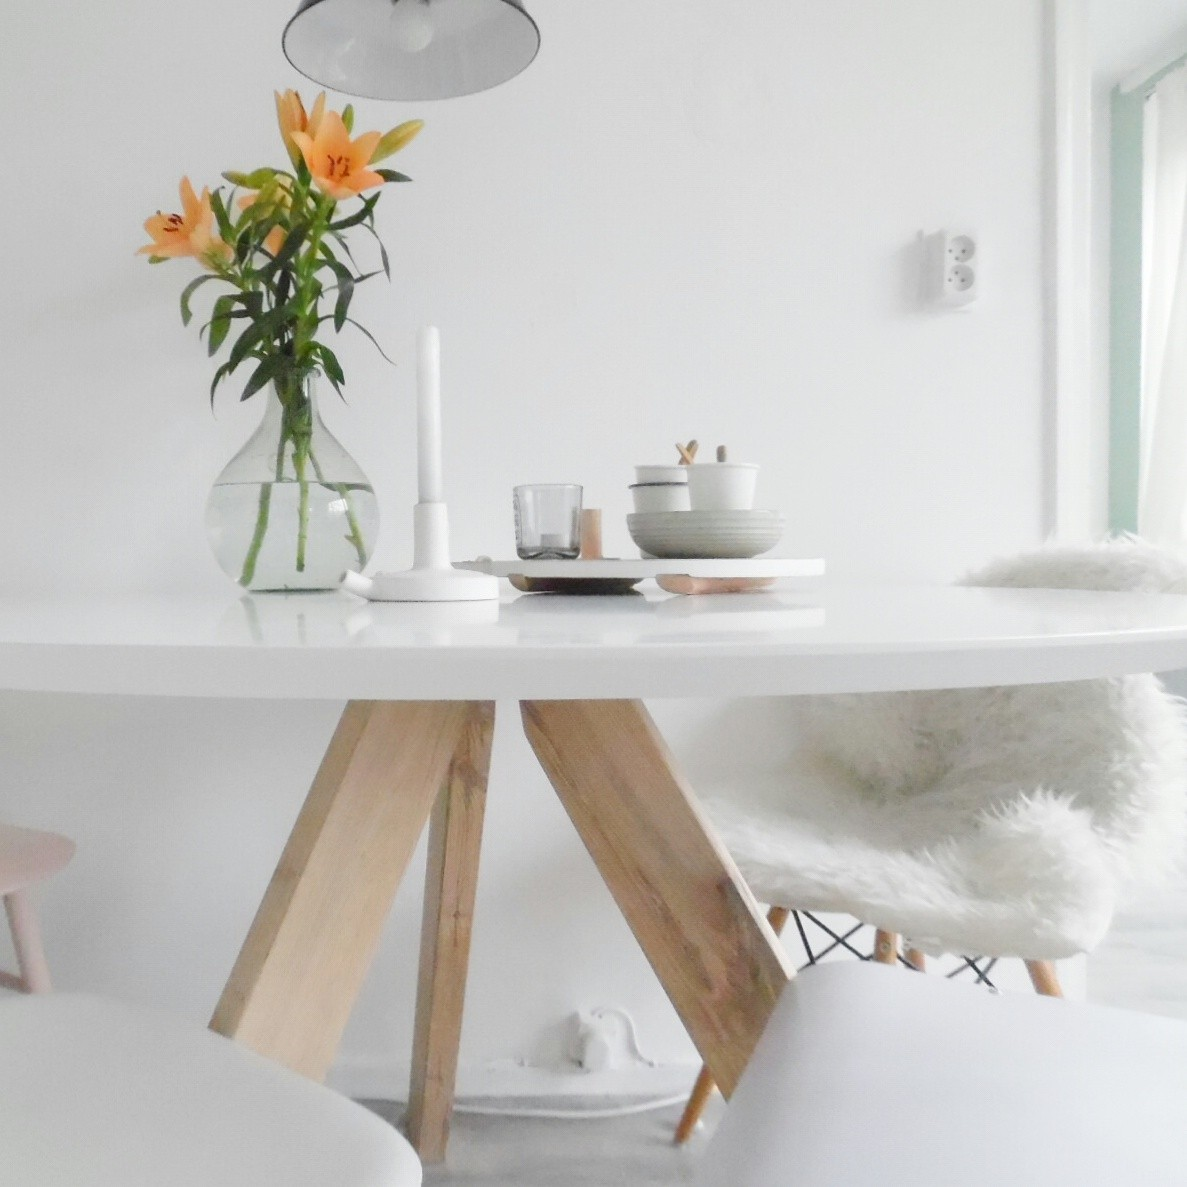 Ronde eetkamertafel hout wit